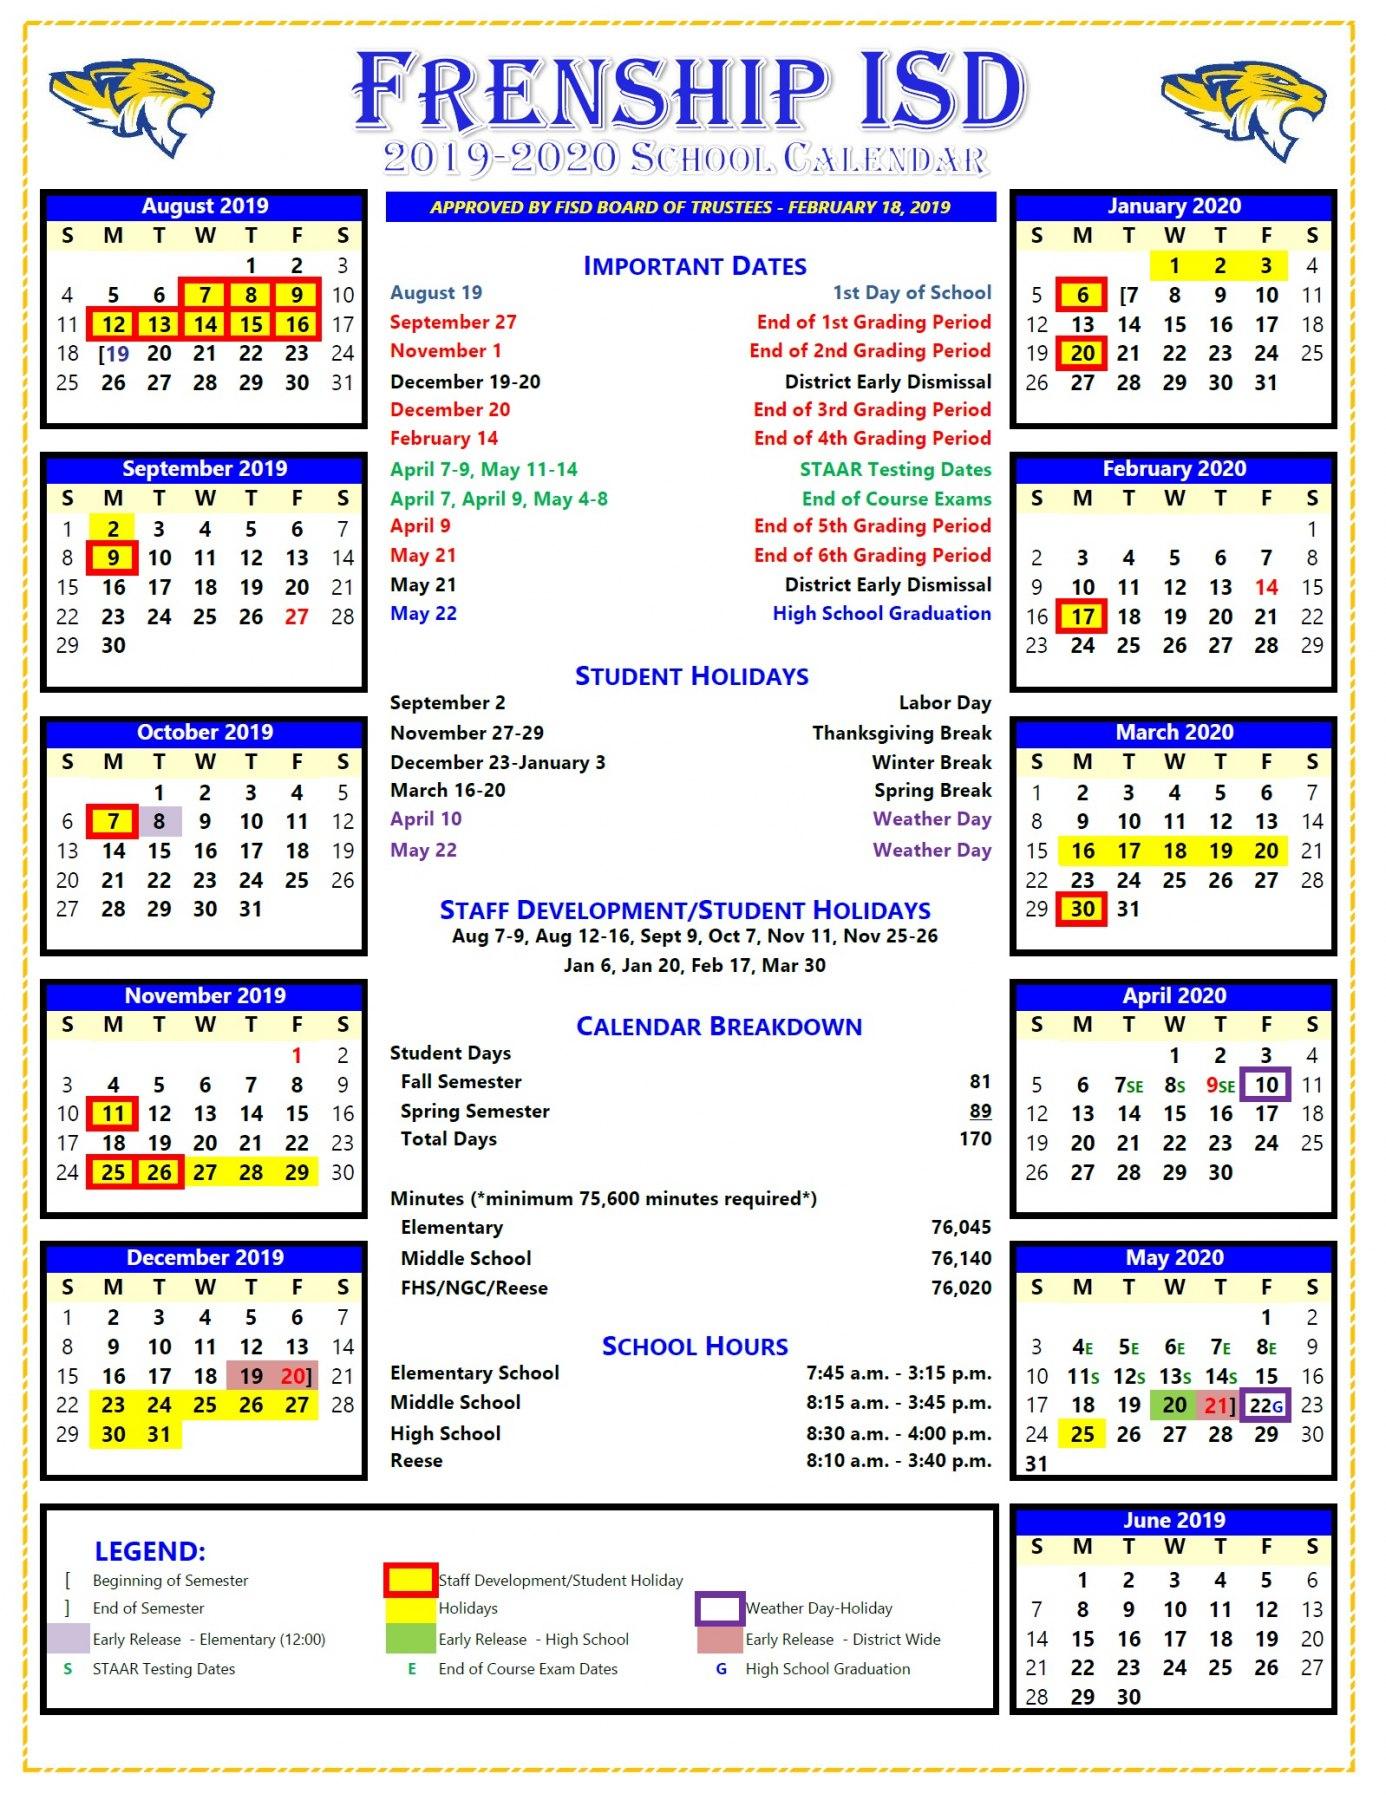 Milwaukee Public Schools Calendar 2020 | Free Printable within University Milwaukee Academic Calender